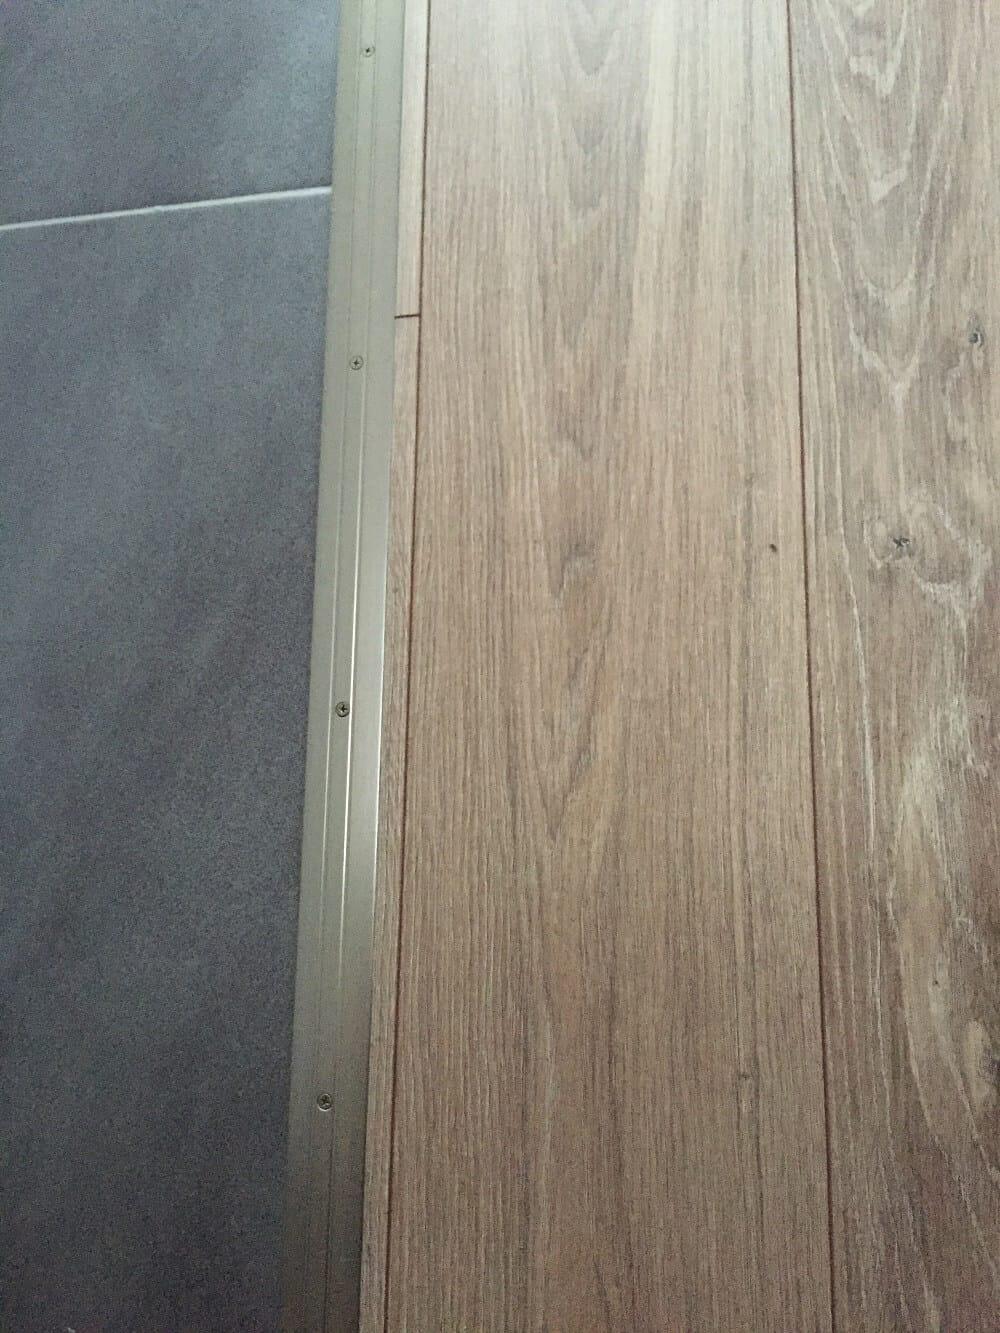 Fußboden Laminat Parkett Hausbau Neubau